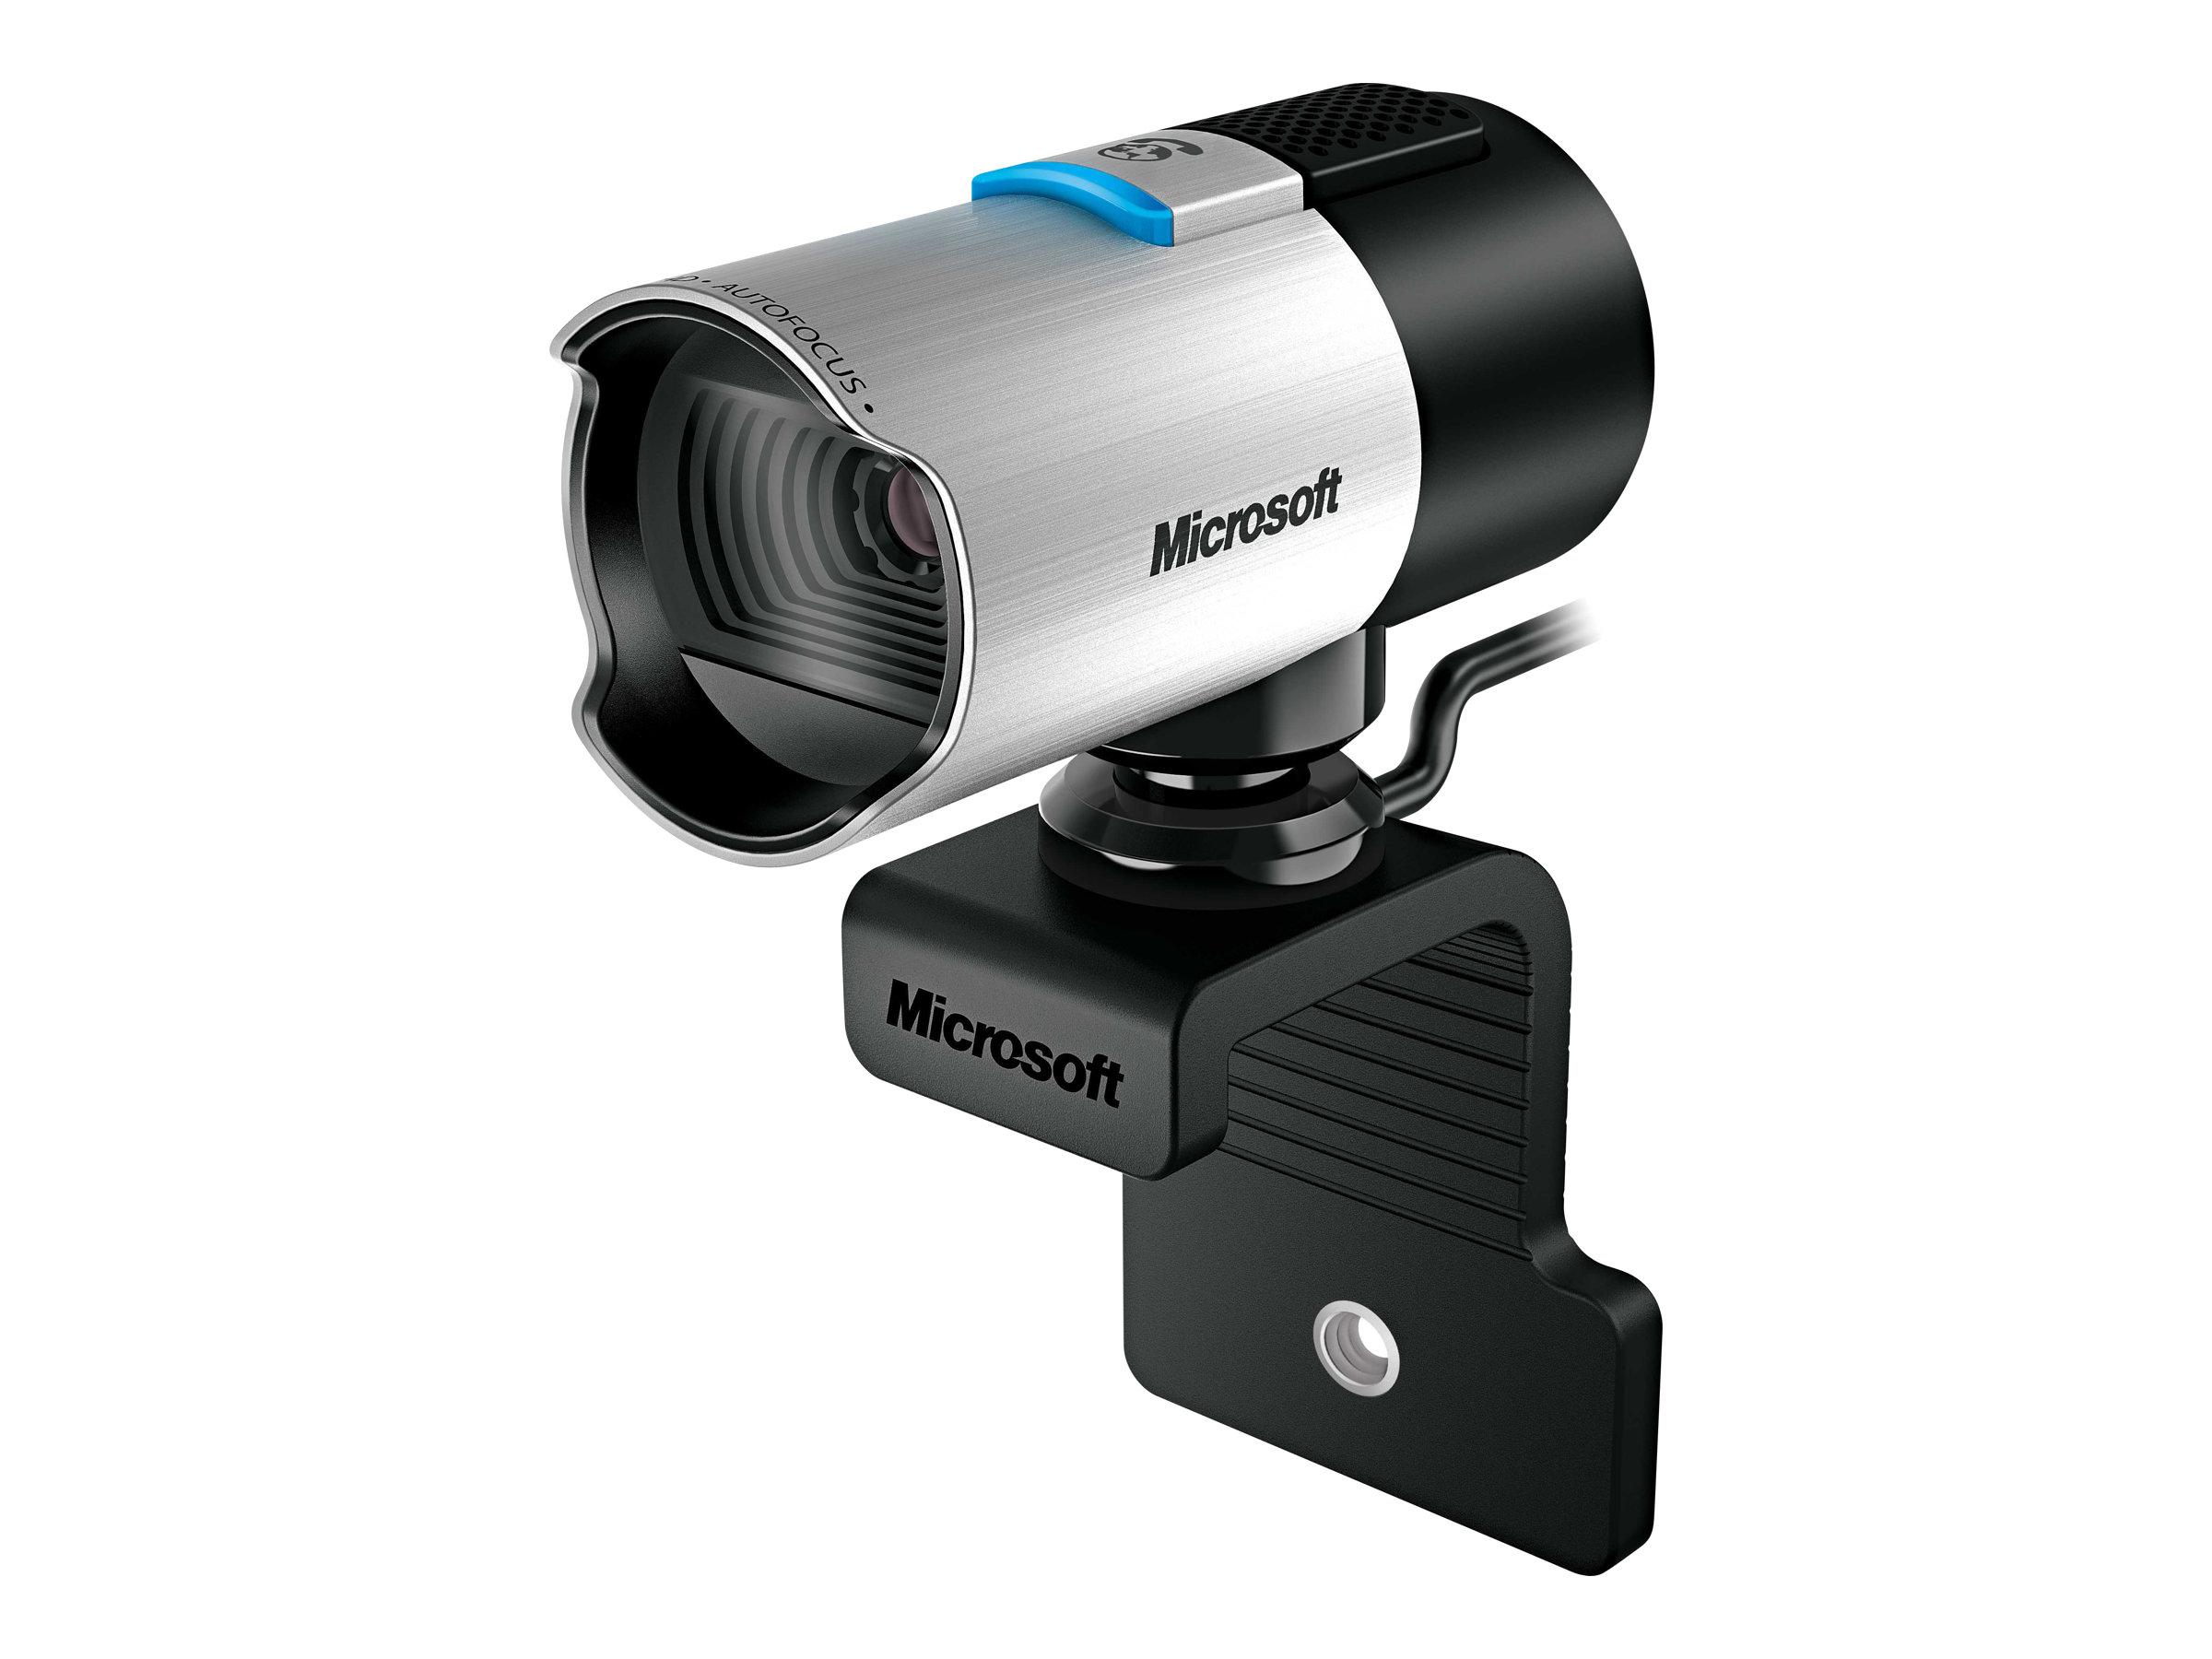 Microsoft LifeCam Studio - Web-Kamera - Farbe - 1920 x 1080 - Audio - USB 2.0